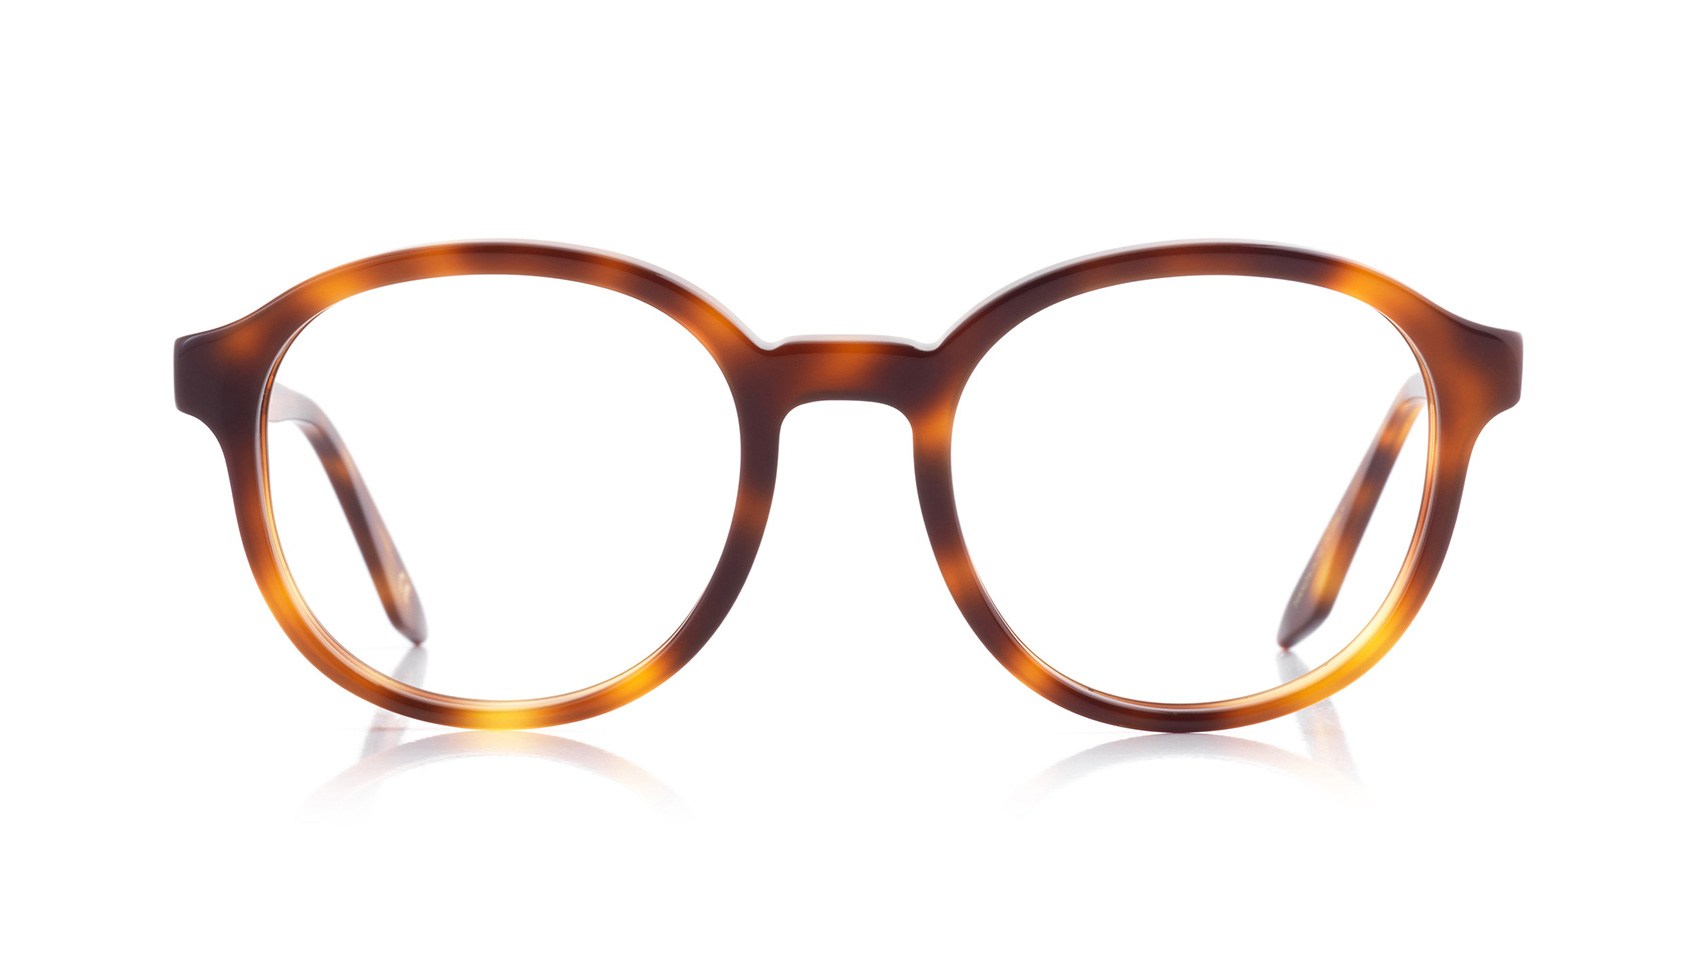 Robert La Roche - Optical Carboy RLR973 03